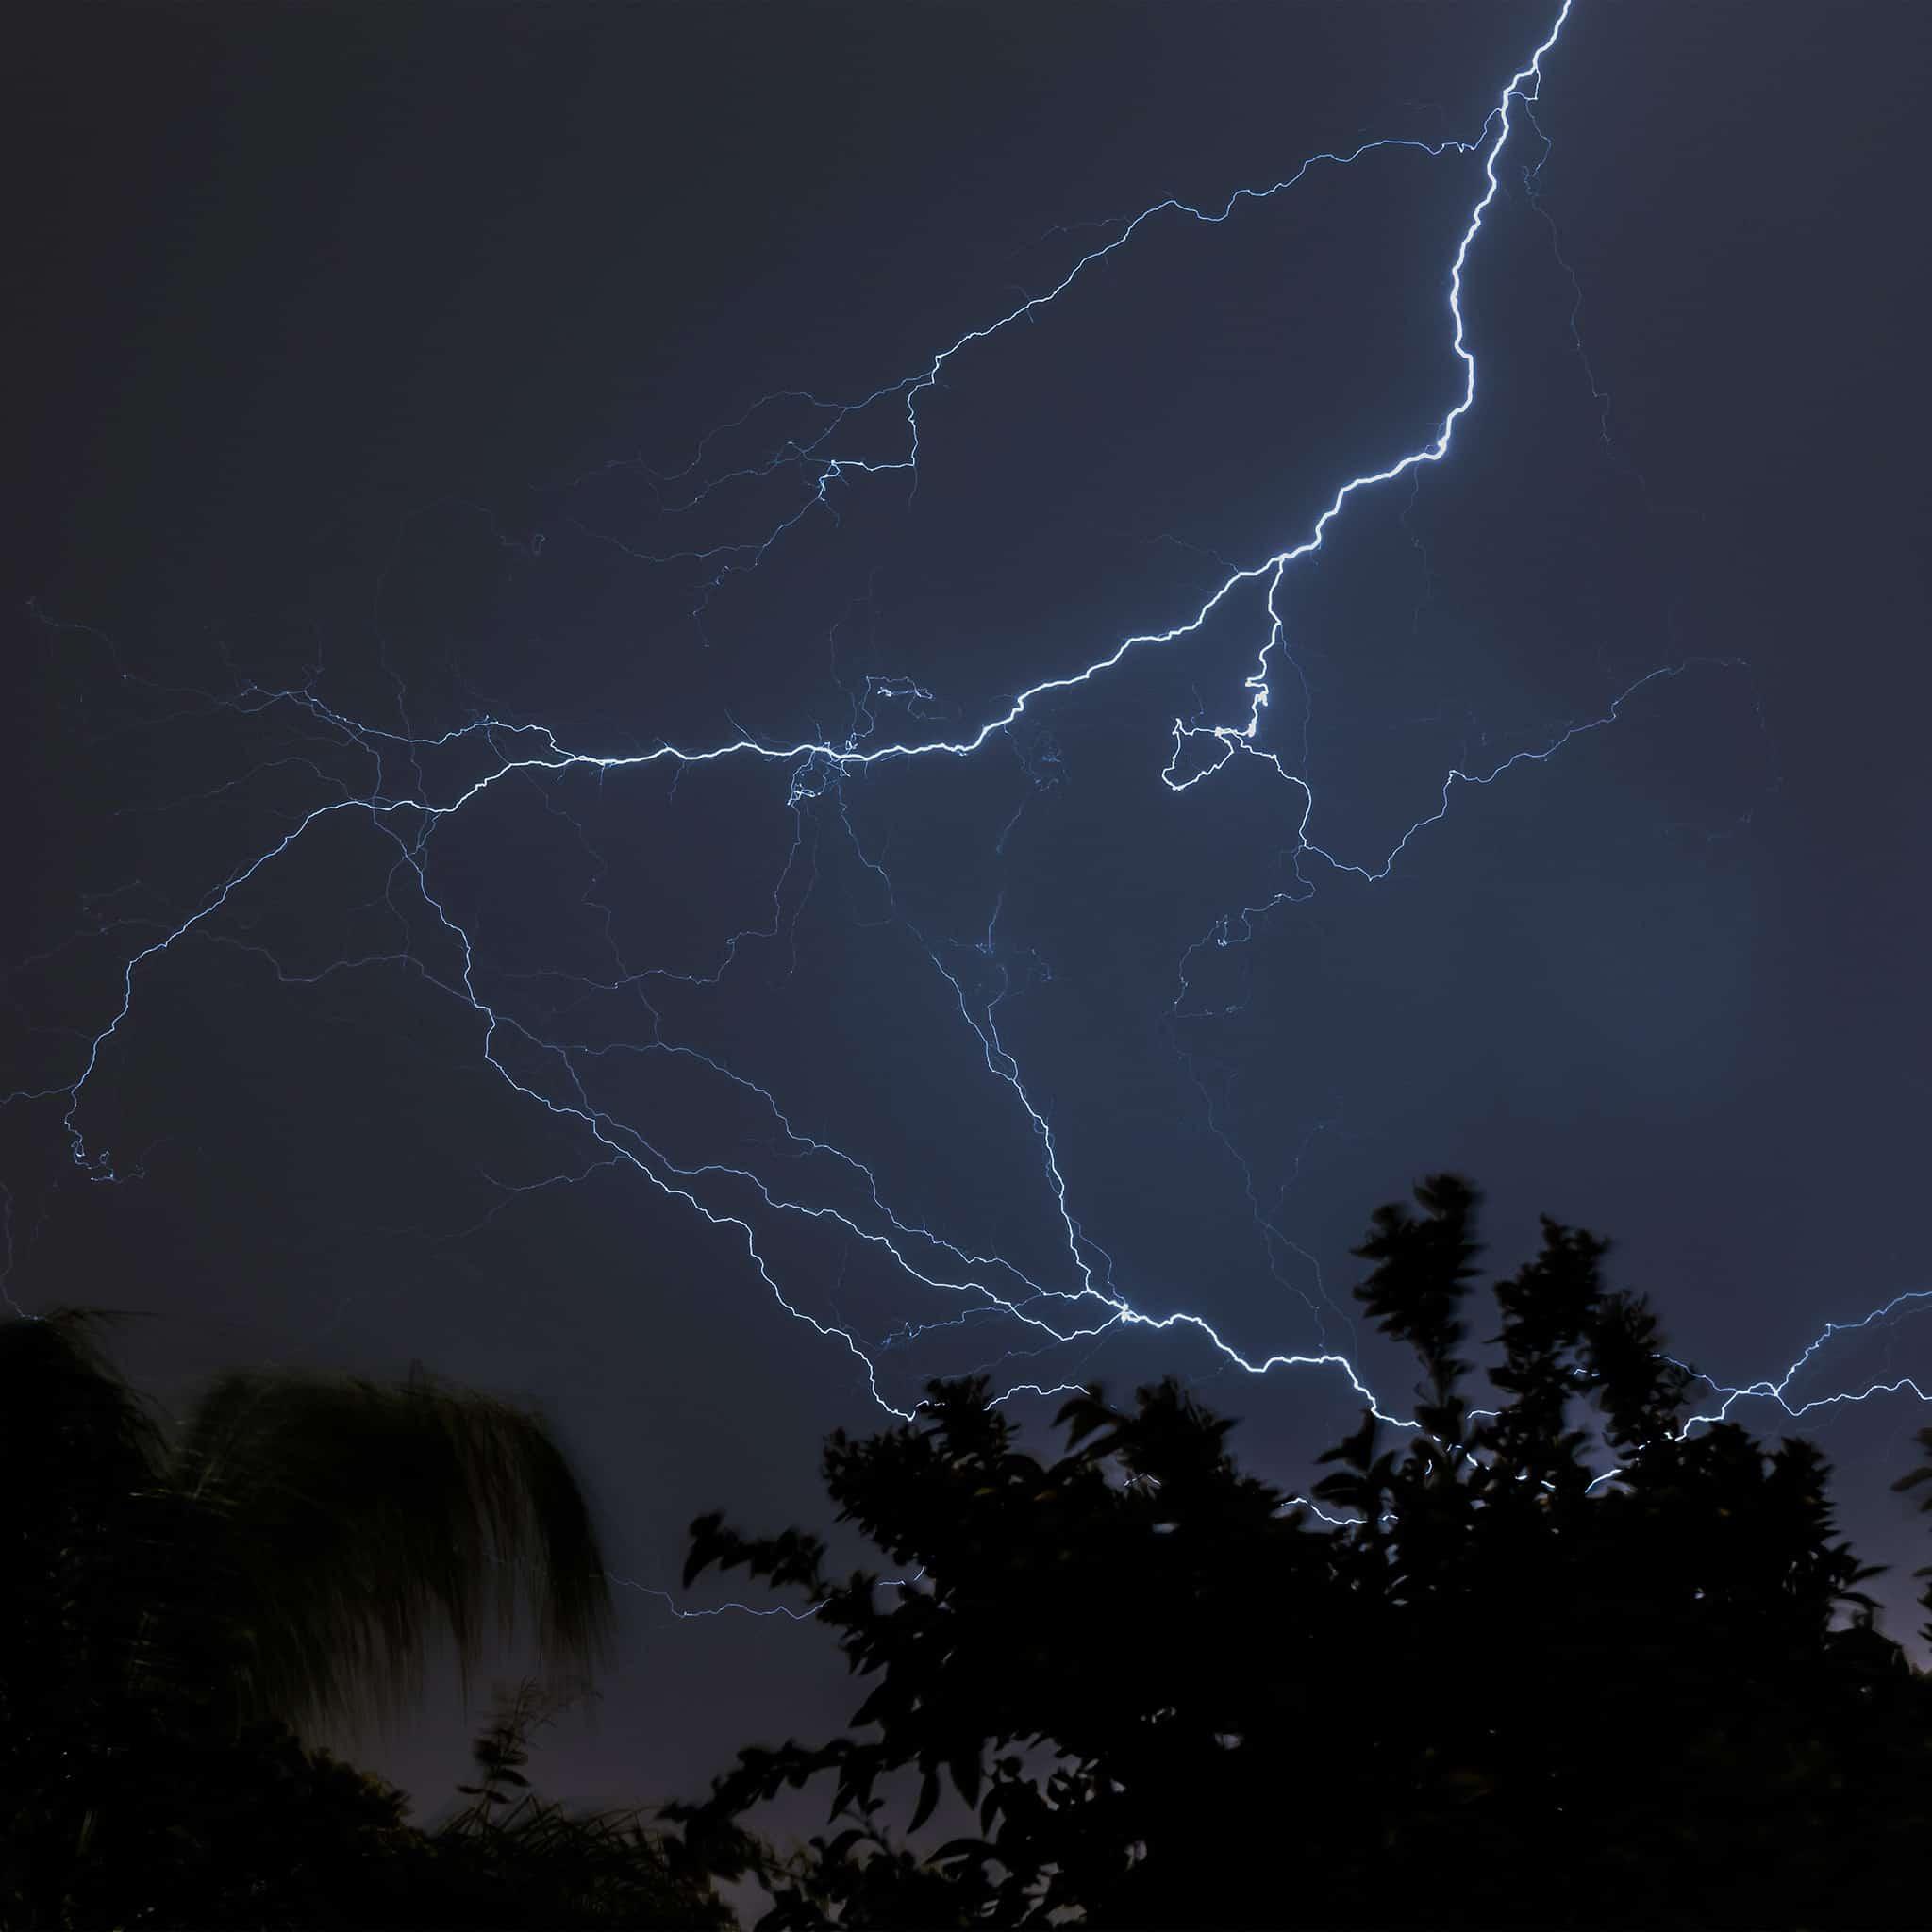 Papers.co-nj83-thunder-bolt-sky-night-dark-android-medium